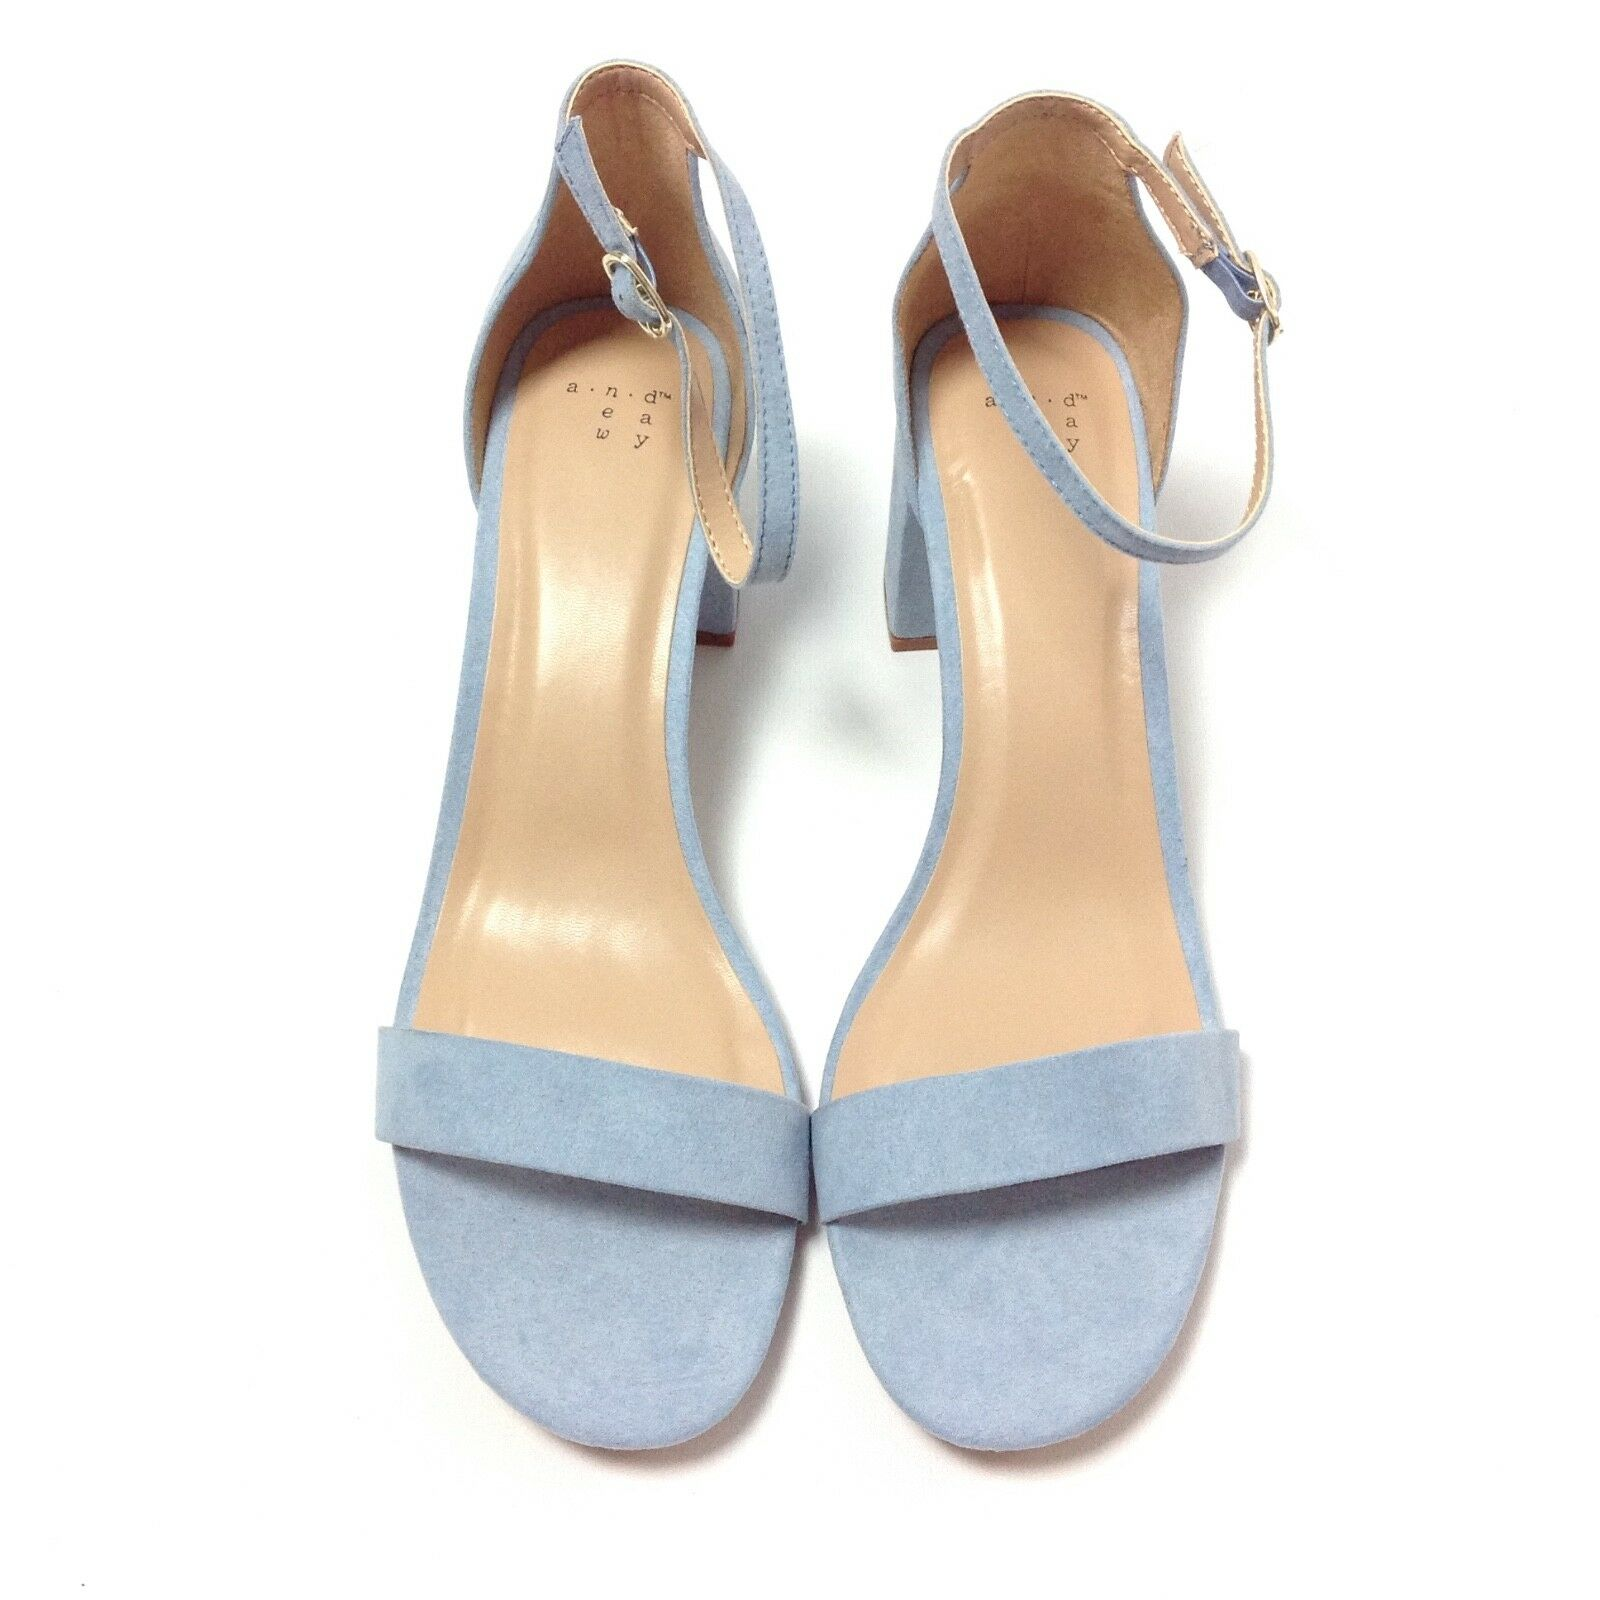 Dexflex Comfort 171644 WW Karma Black Women's HEELS Shoes